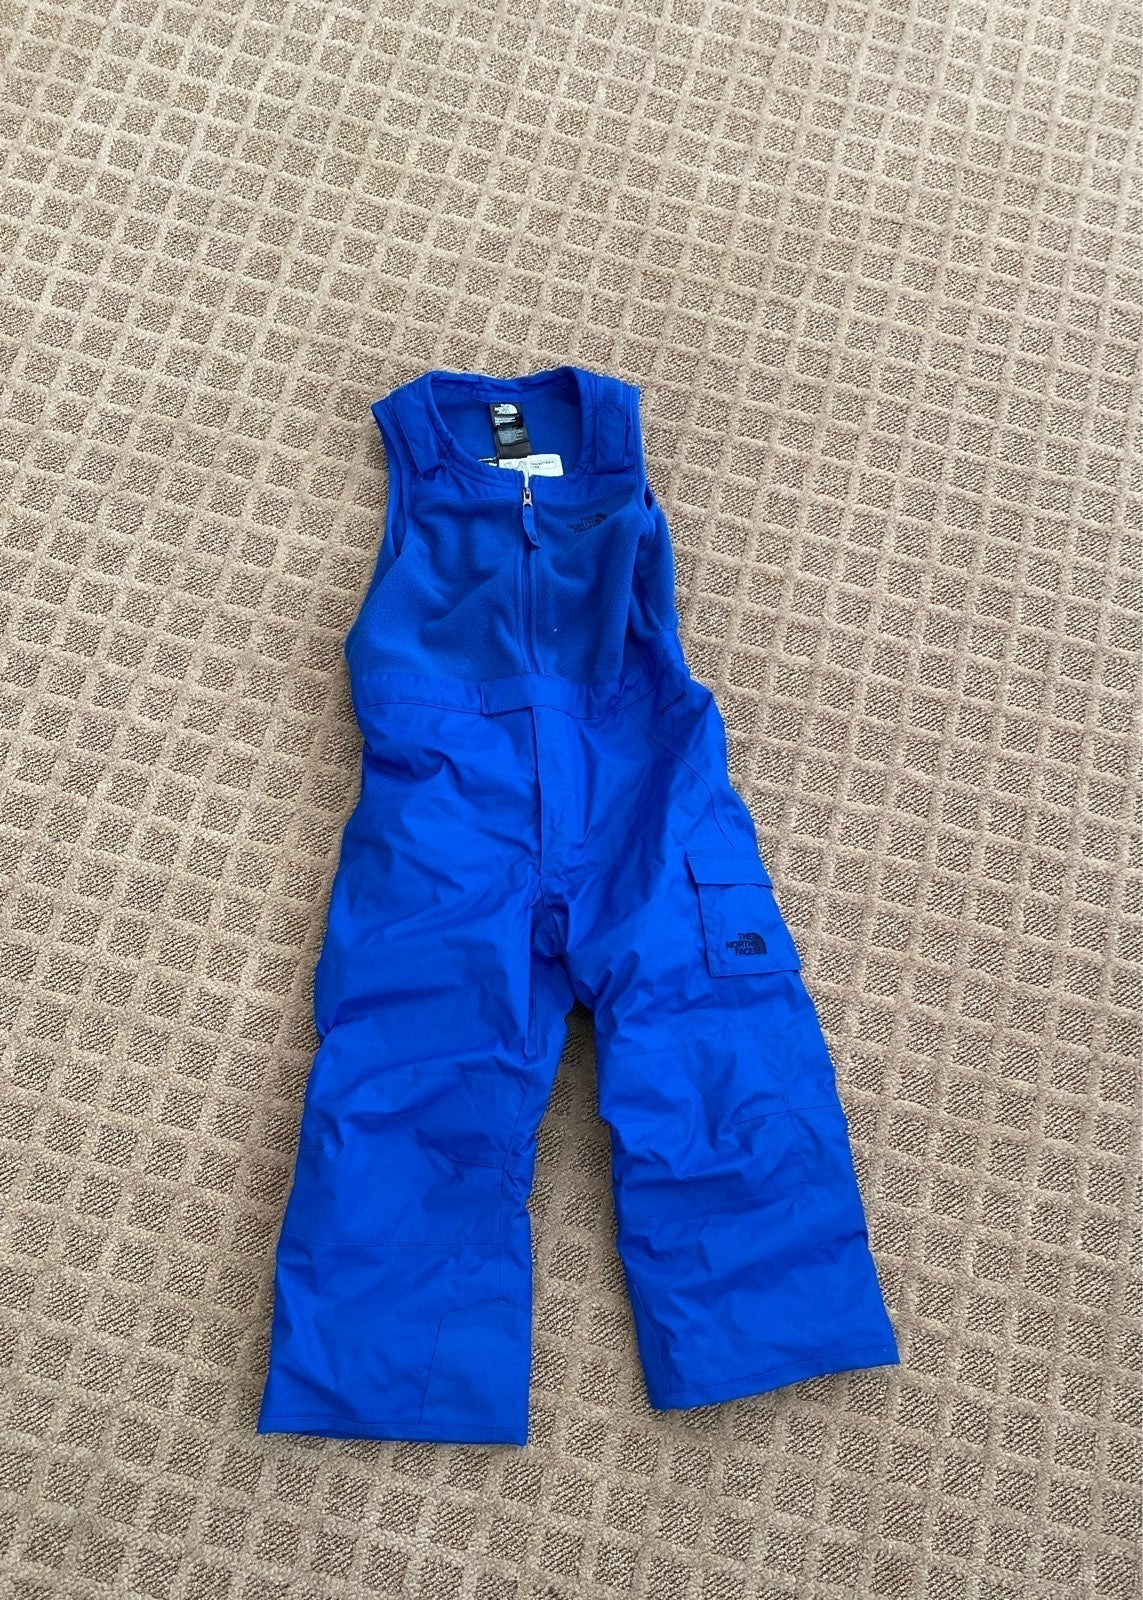 The North Face  ski Snow Pants bibs size